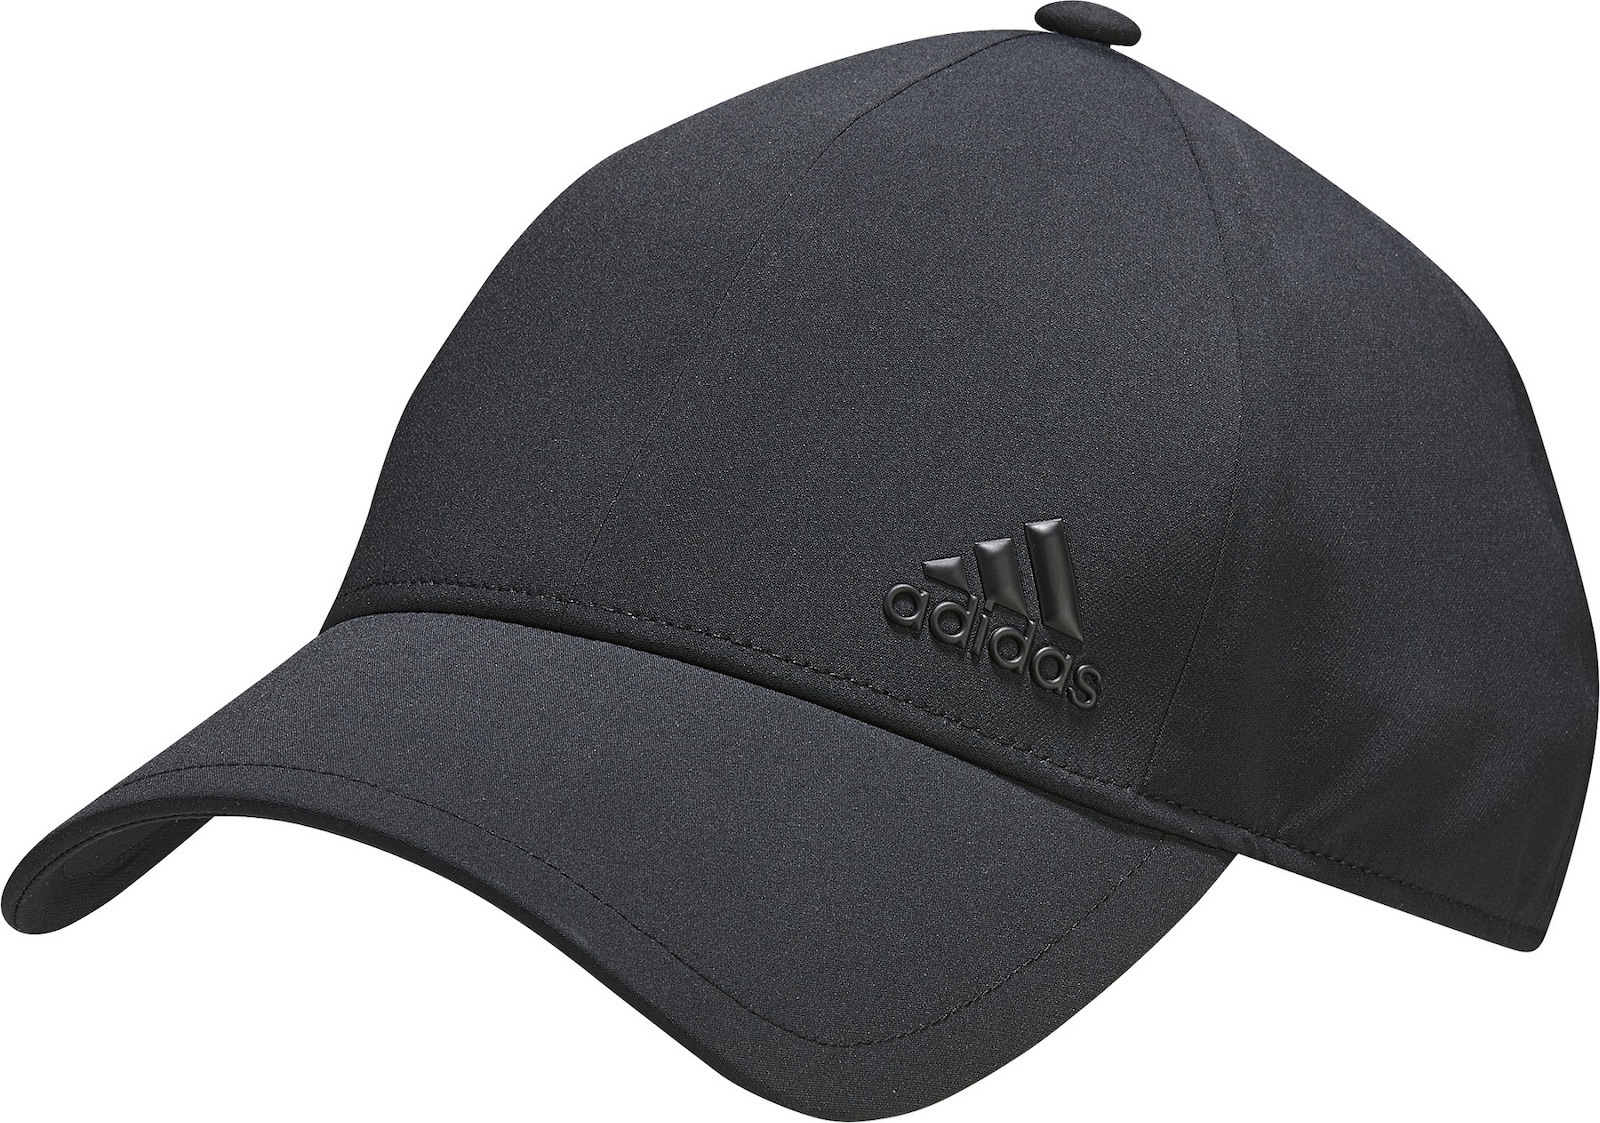 012ae25a6f1 Adidas Bonded Training Cap S97588 Black - Skroutz.gr